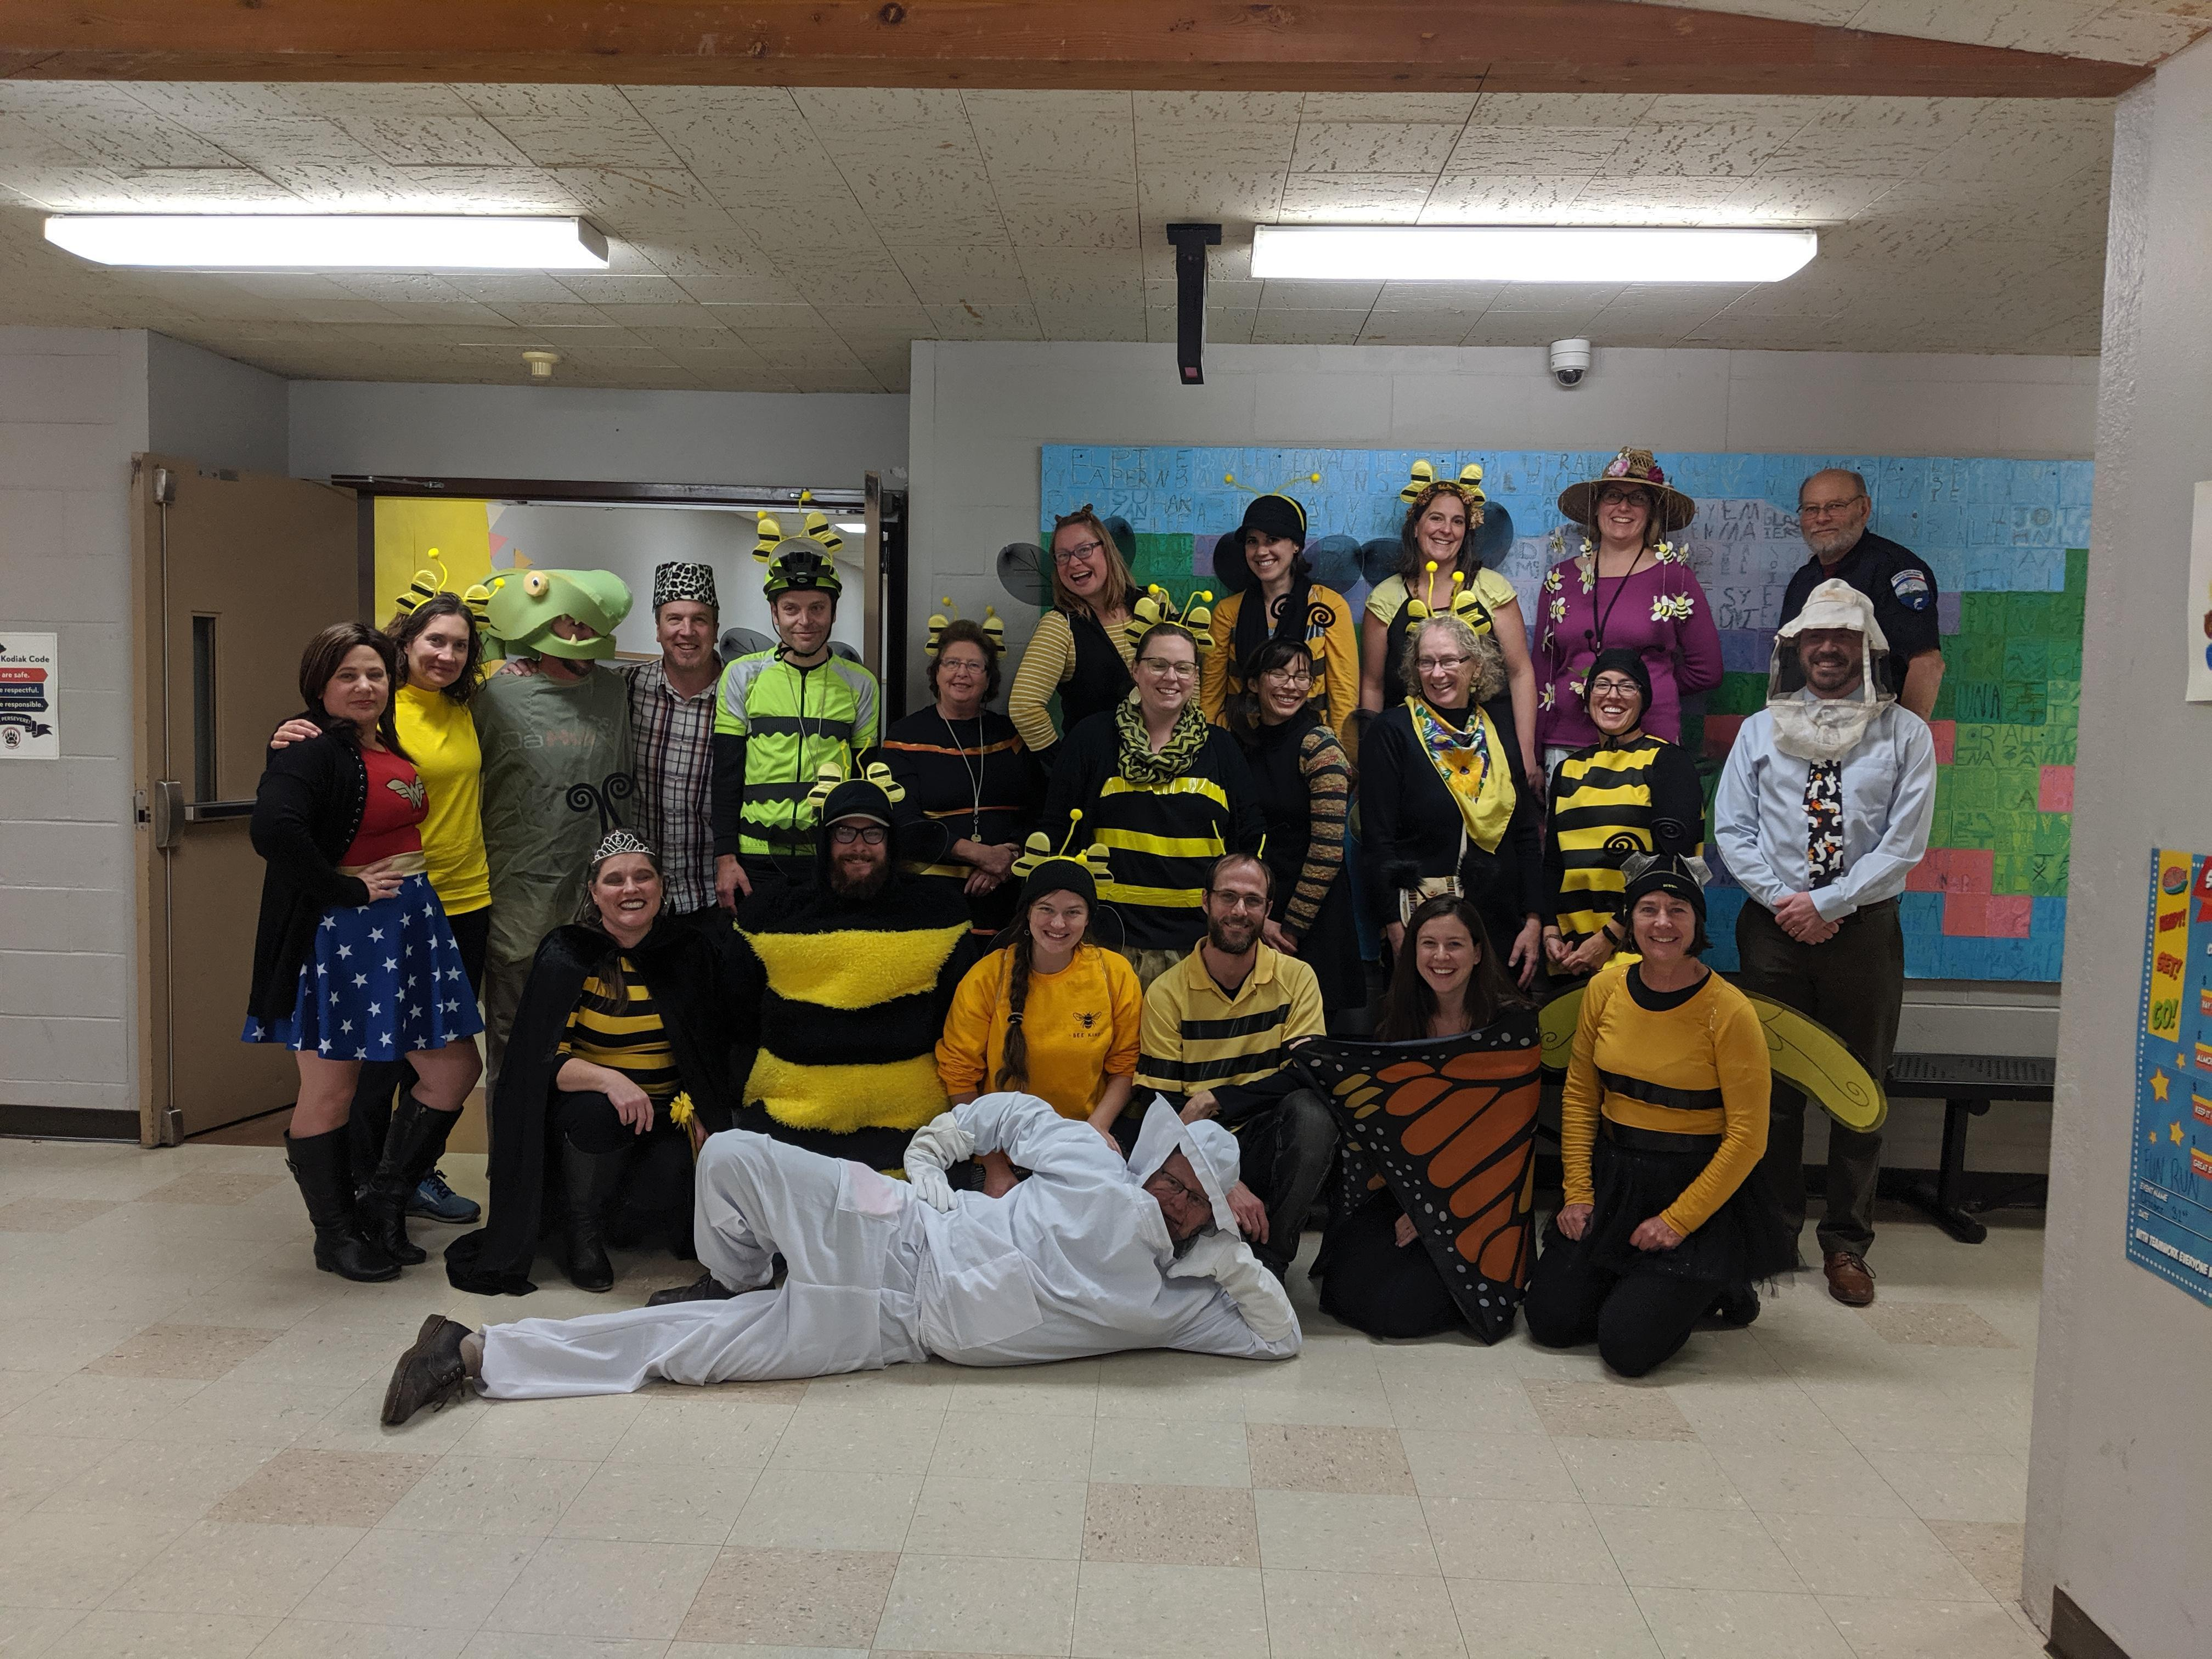 teachers in bee costume